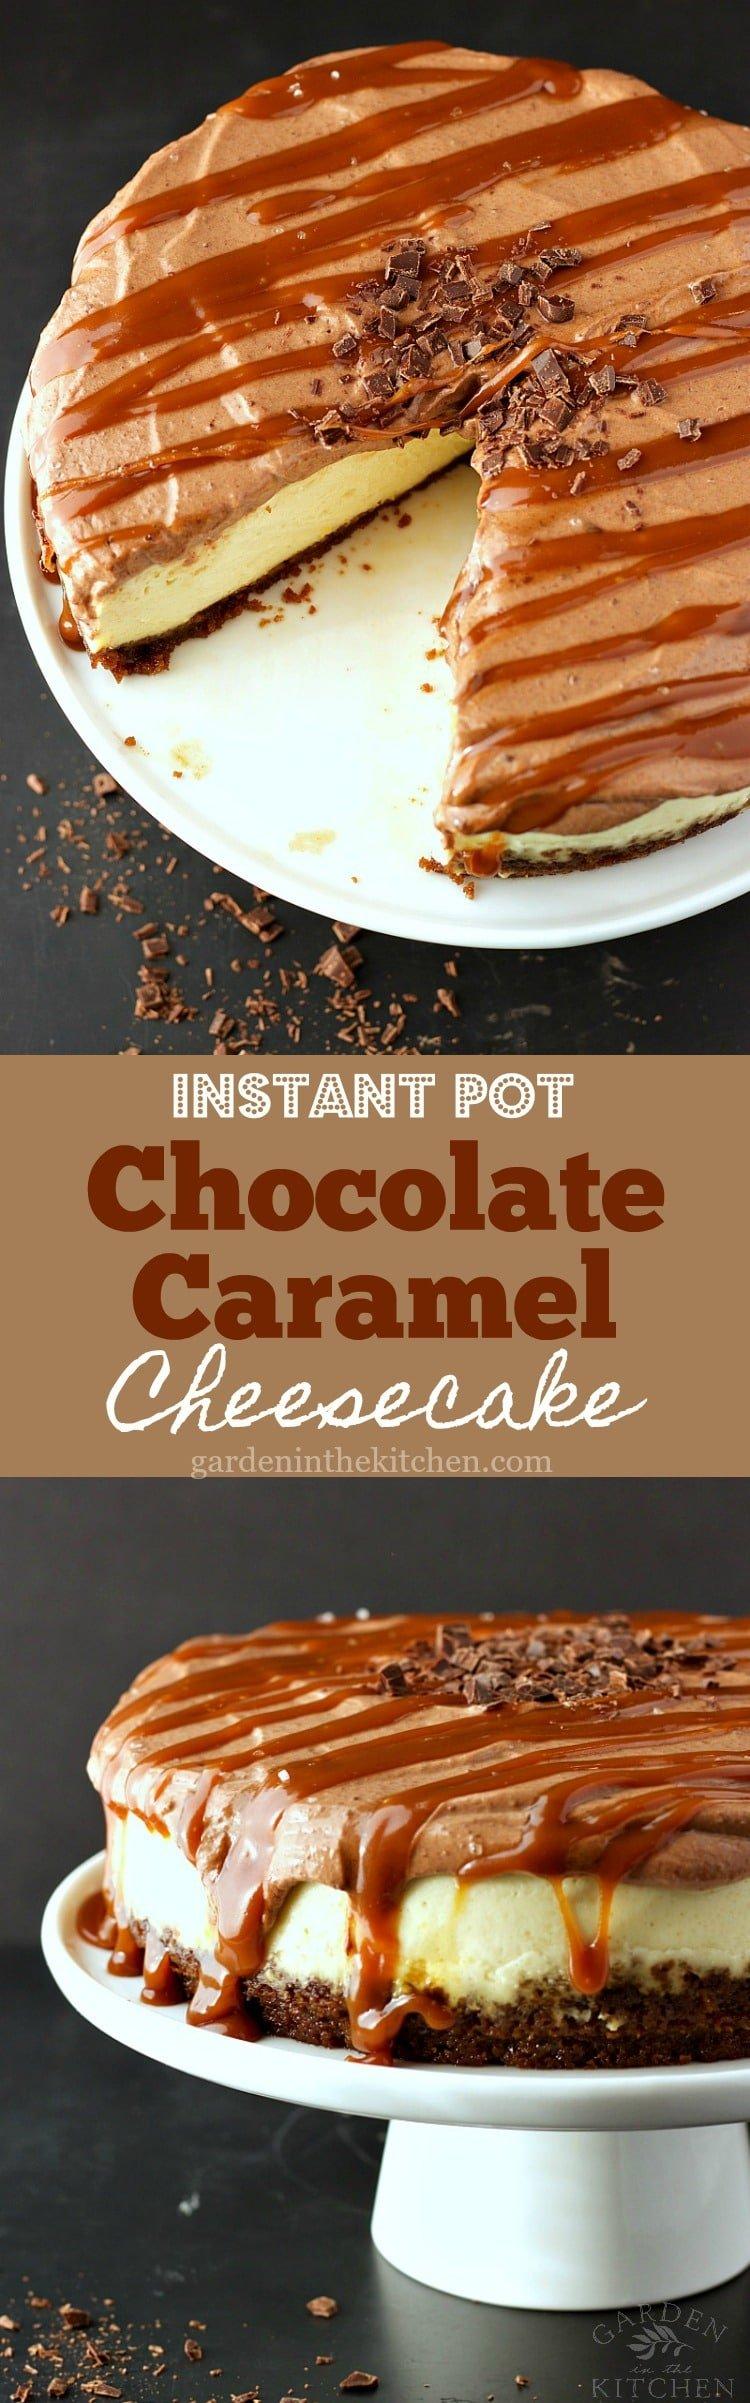 Instant Pot Chocolate Caramel Cheesecake | Garden in the Kitchen